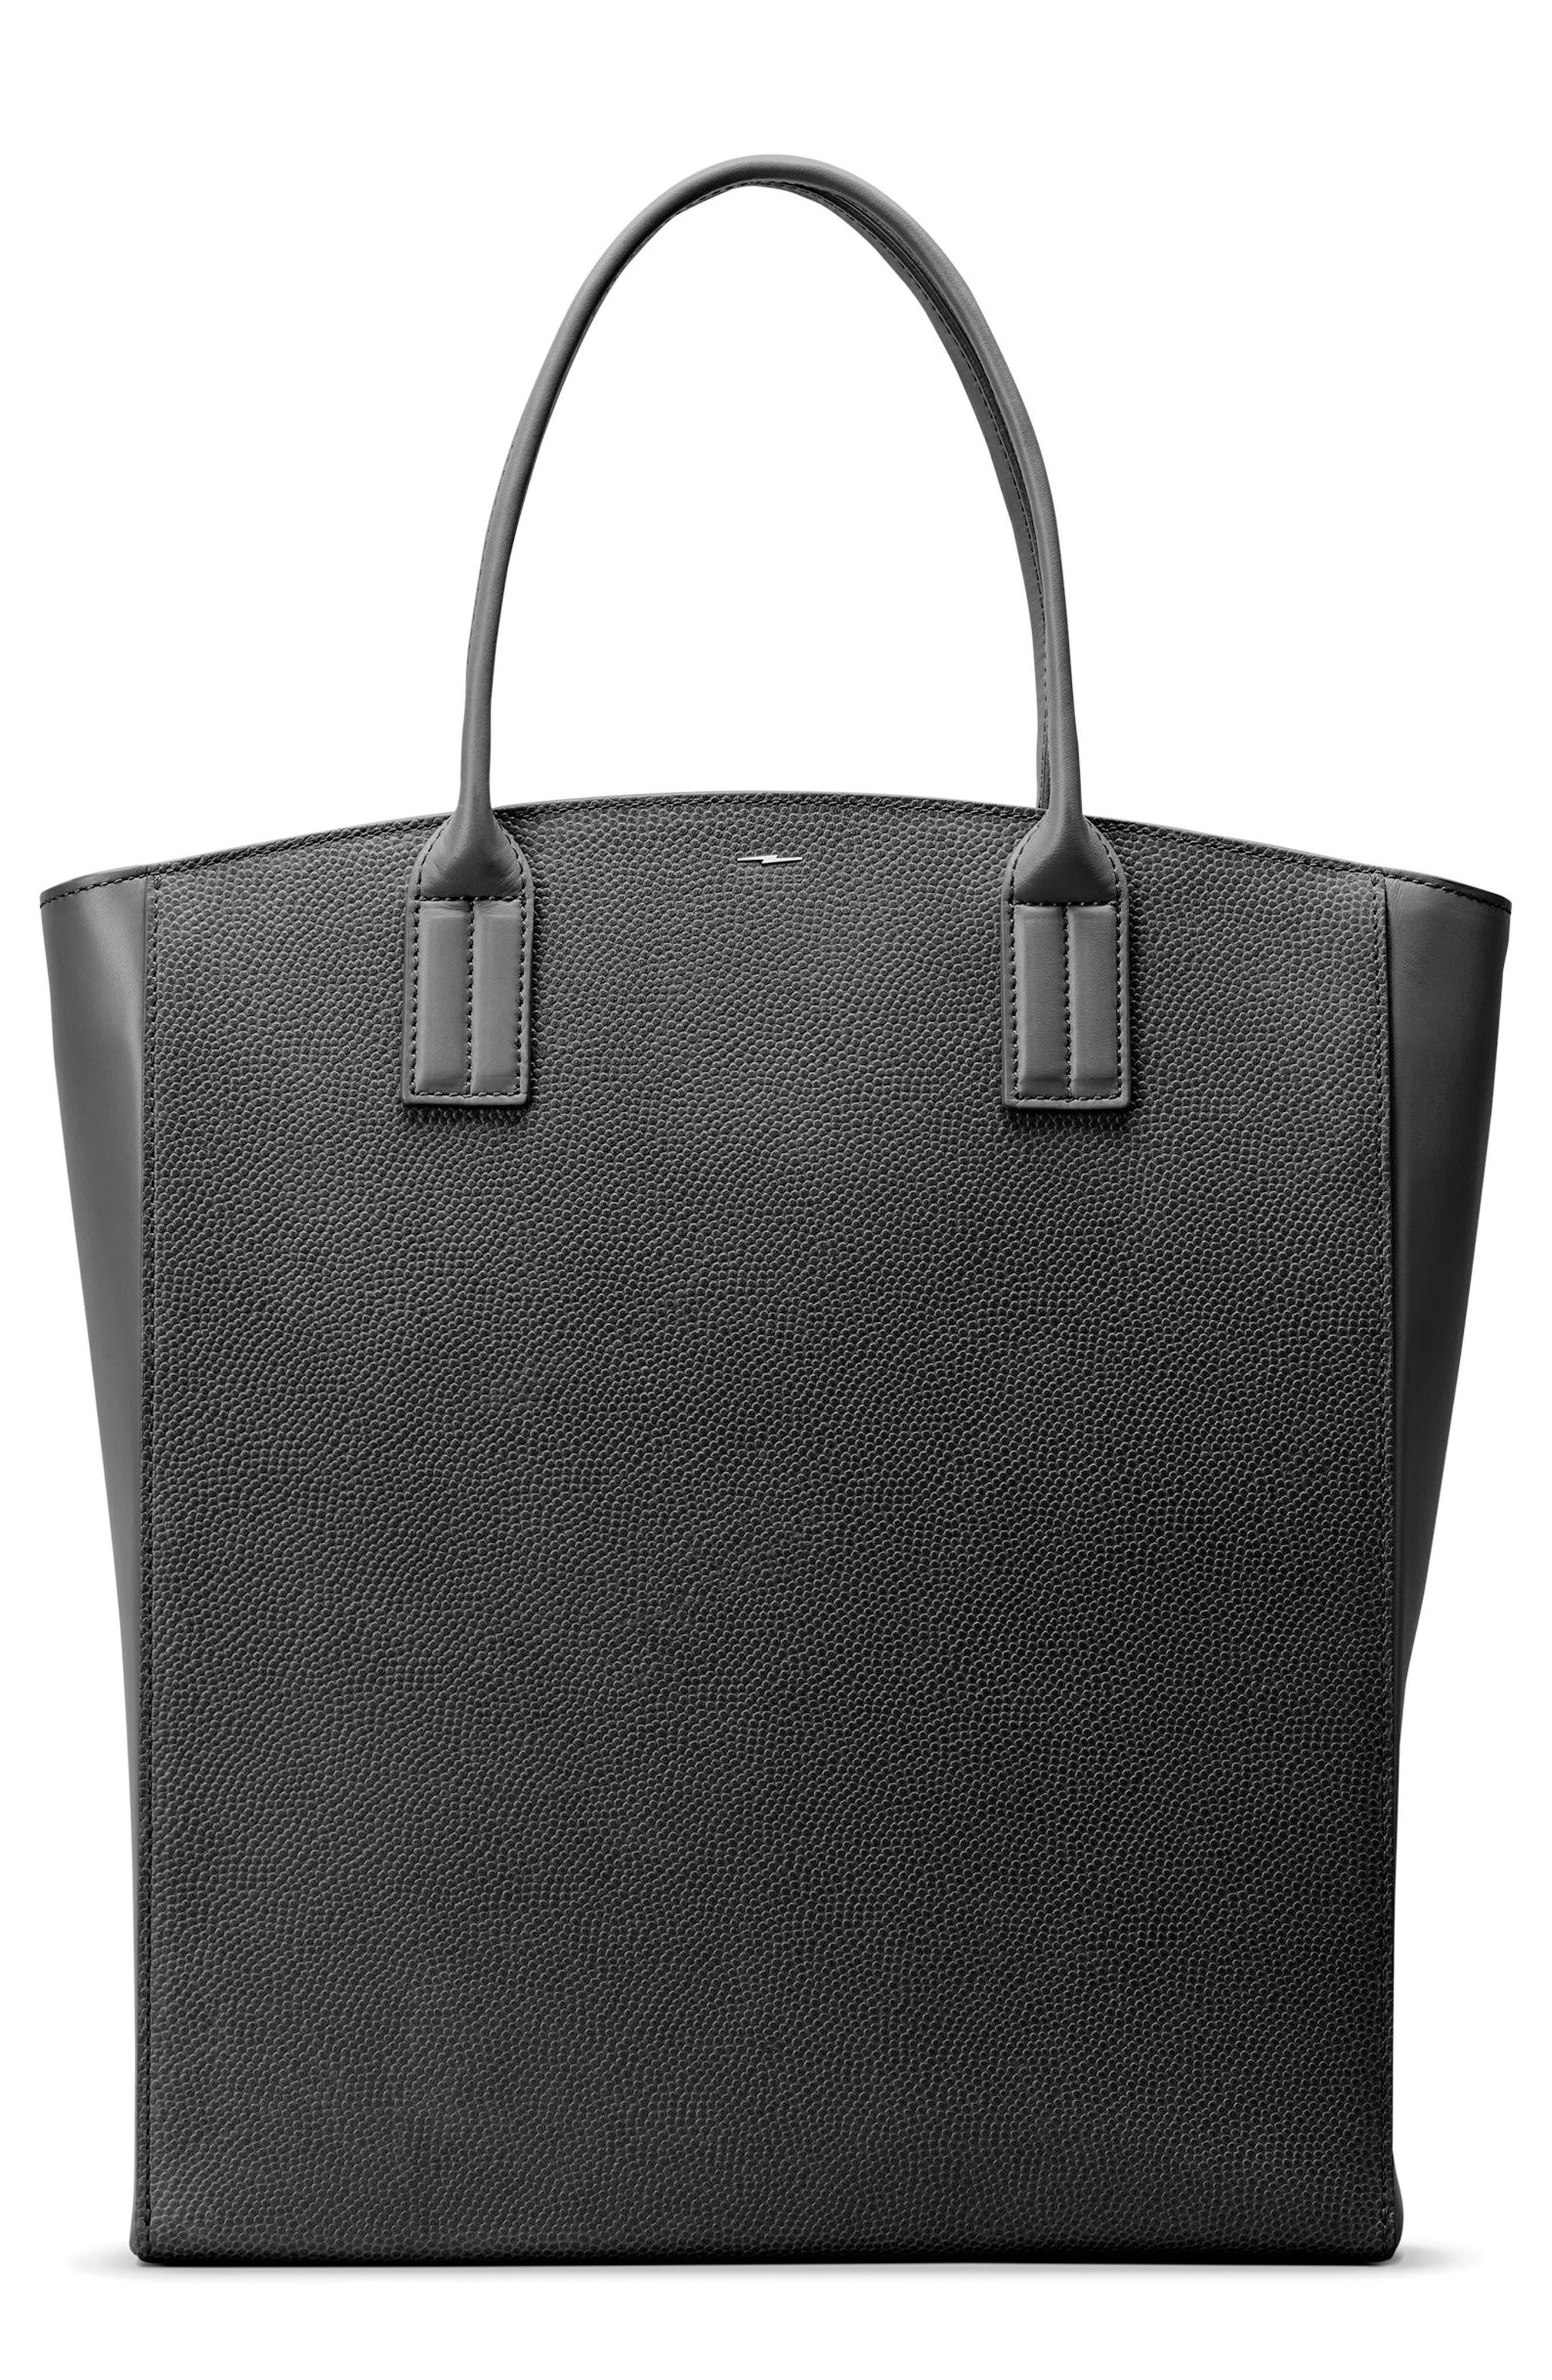 Latigo Leather Tote,                             Main thumbnail 1, color,                             Black